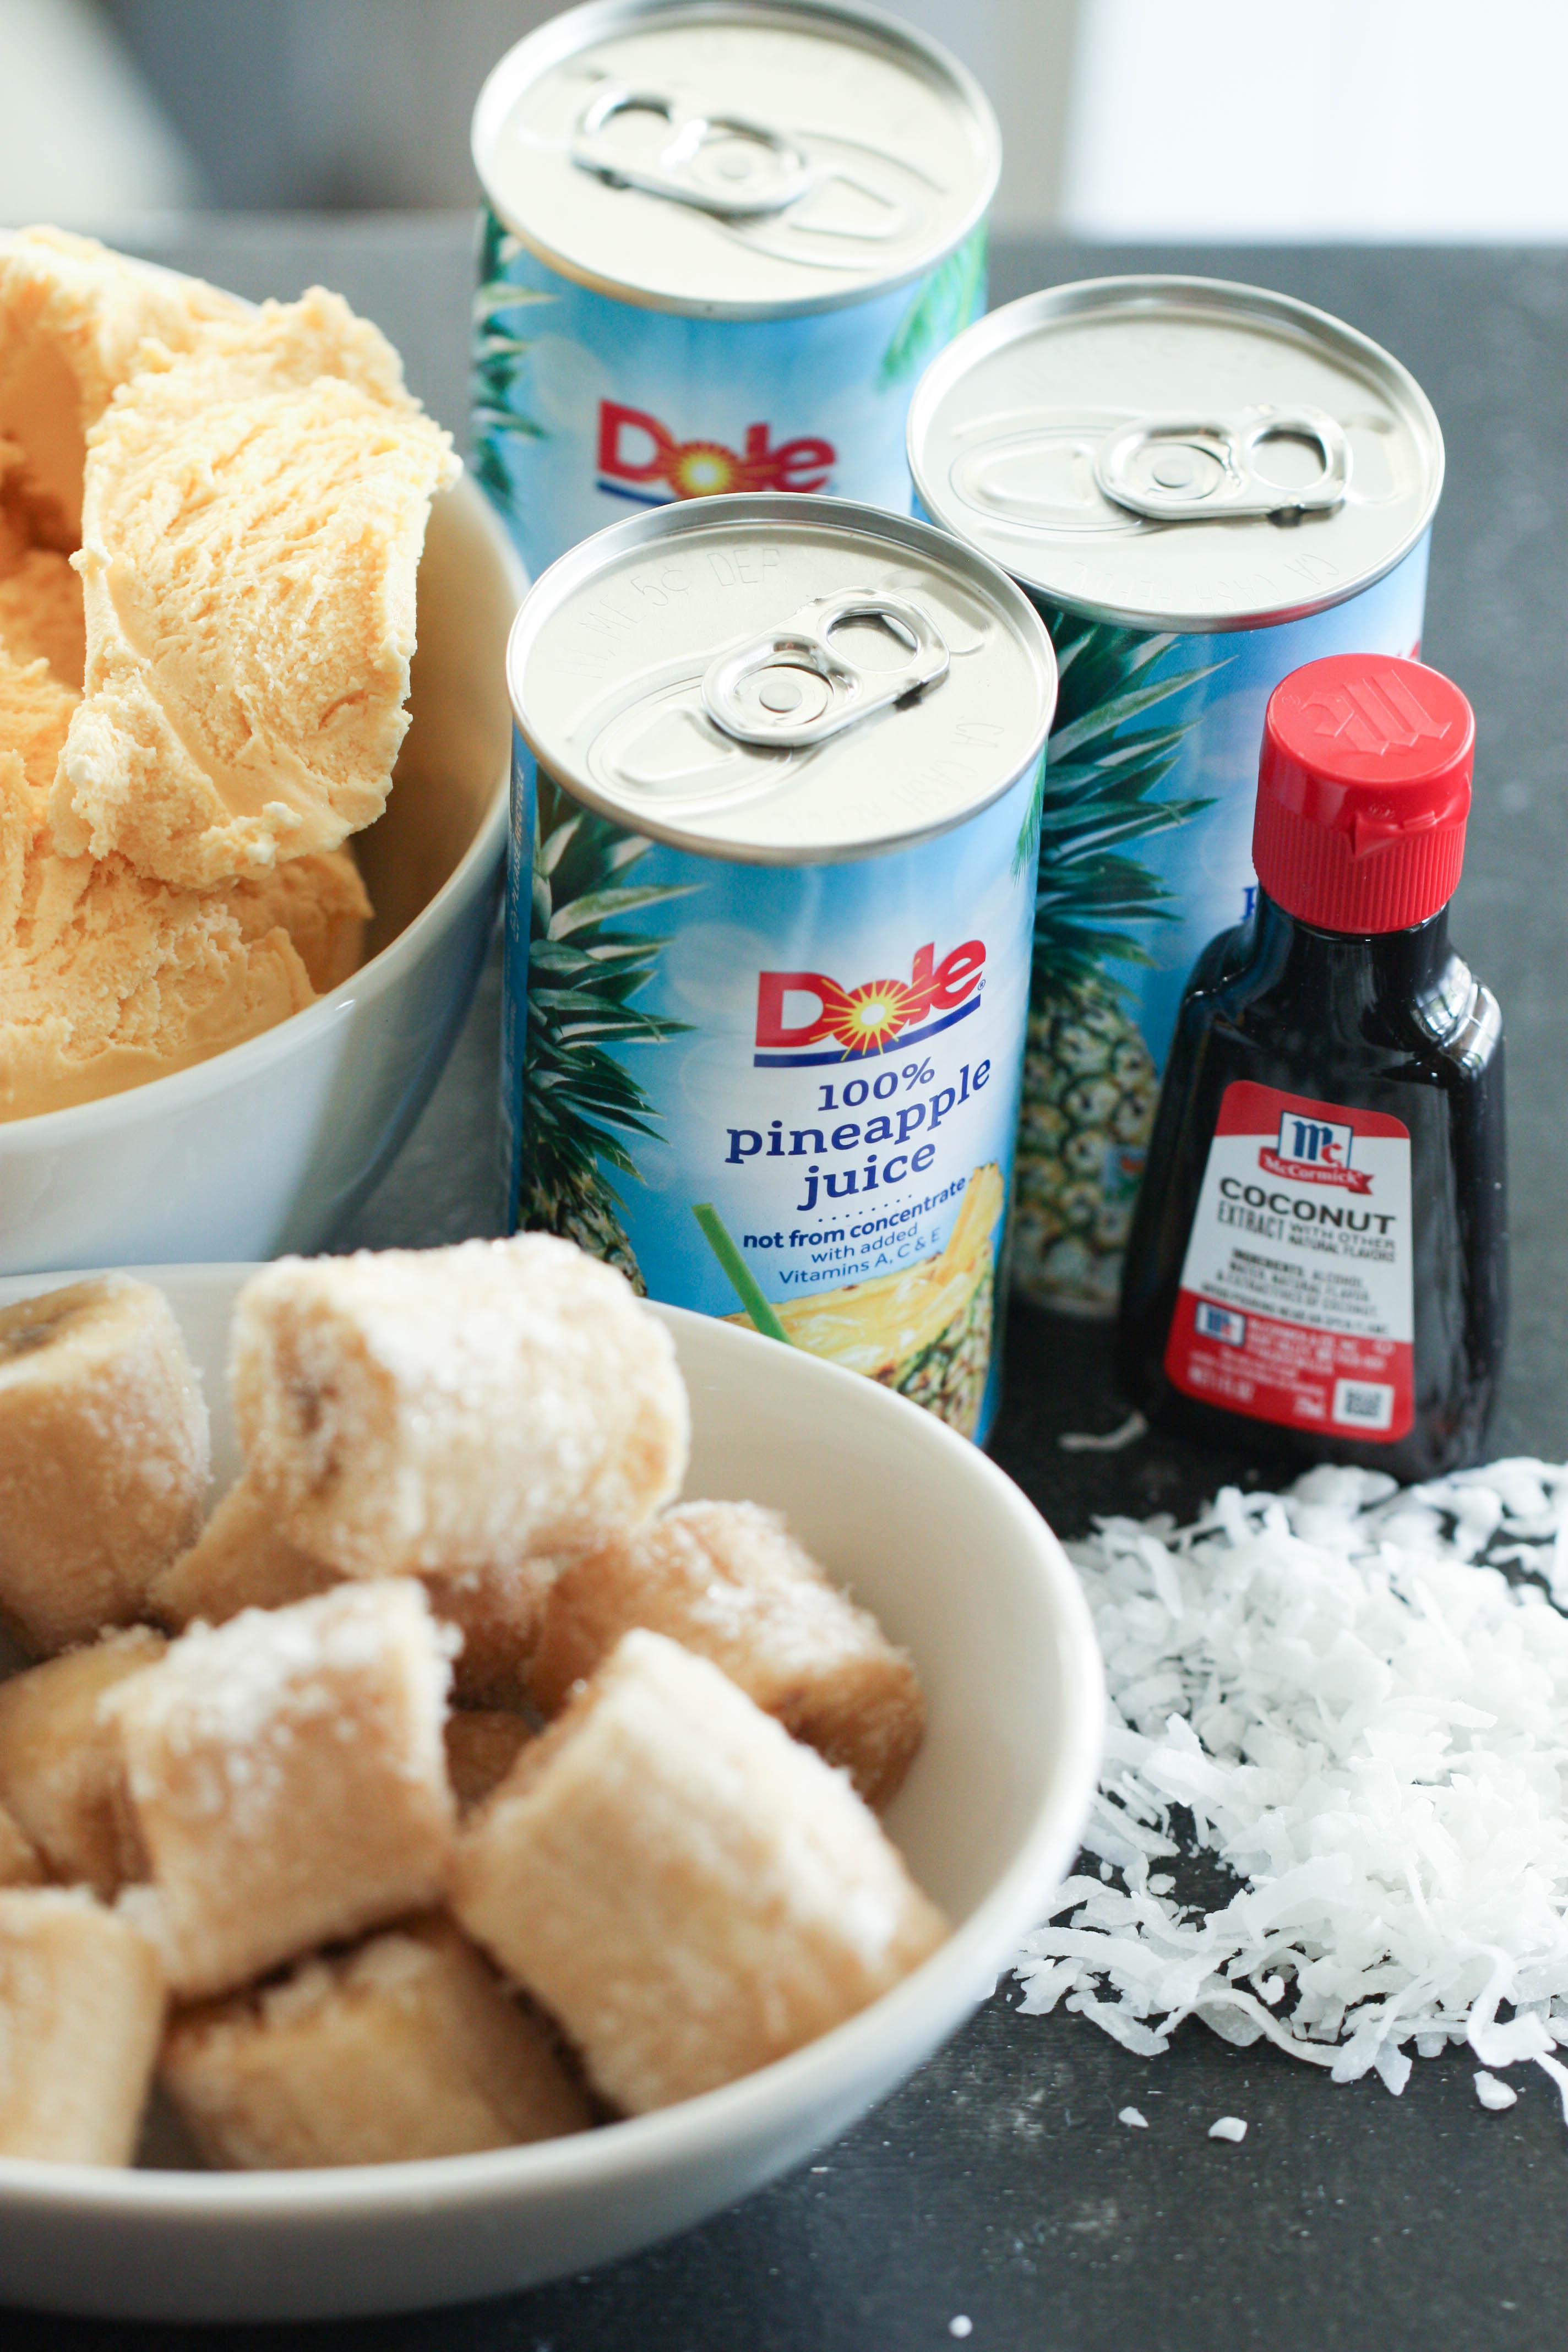 Ingredients for Piña Colada Fruit Smoothie